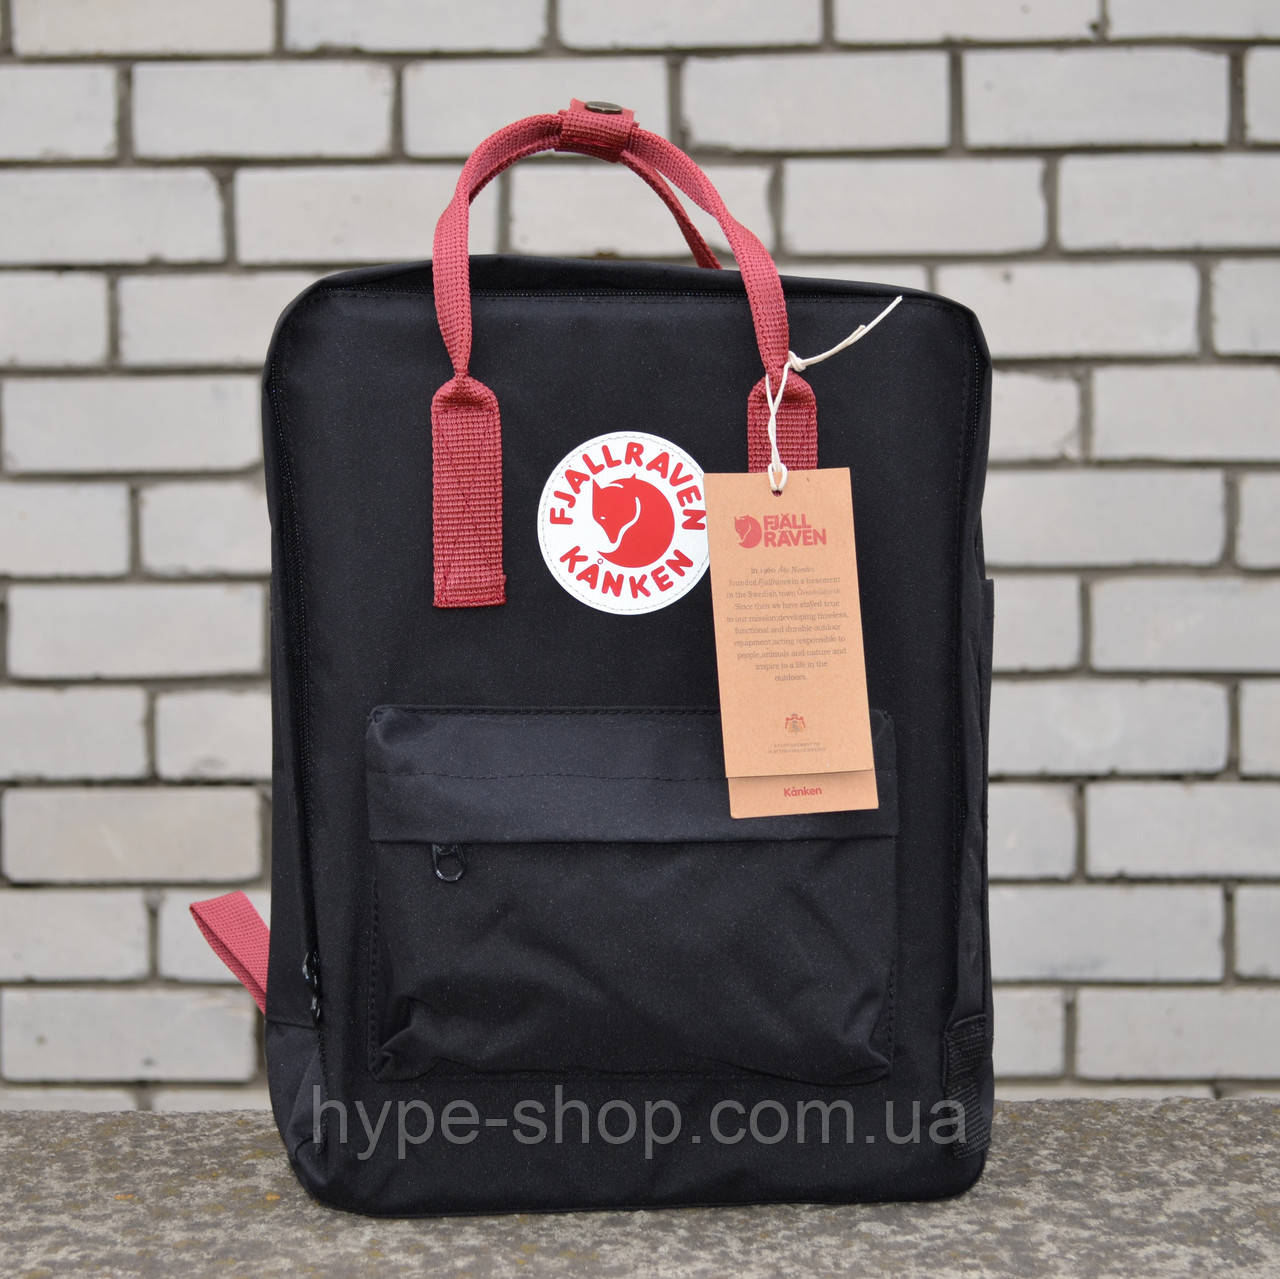 Чорний Рюкзак в стилі Fjallraven Kanken Classic, чорний канкен